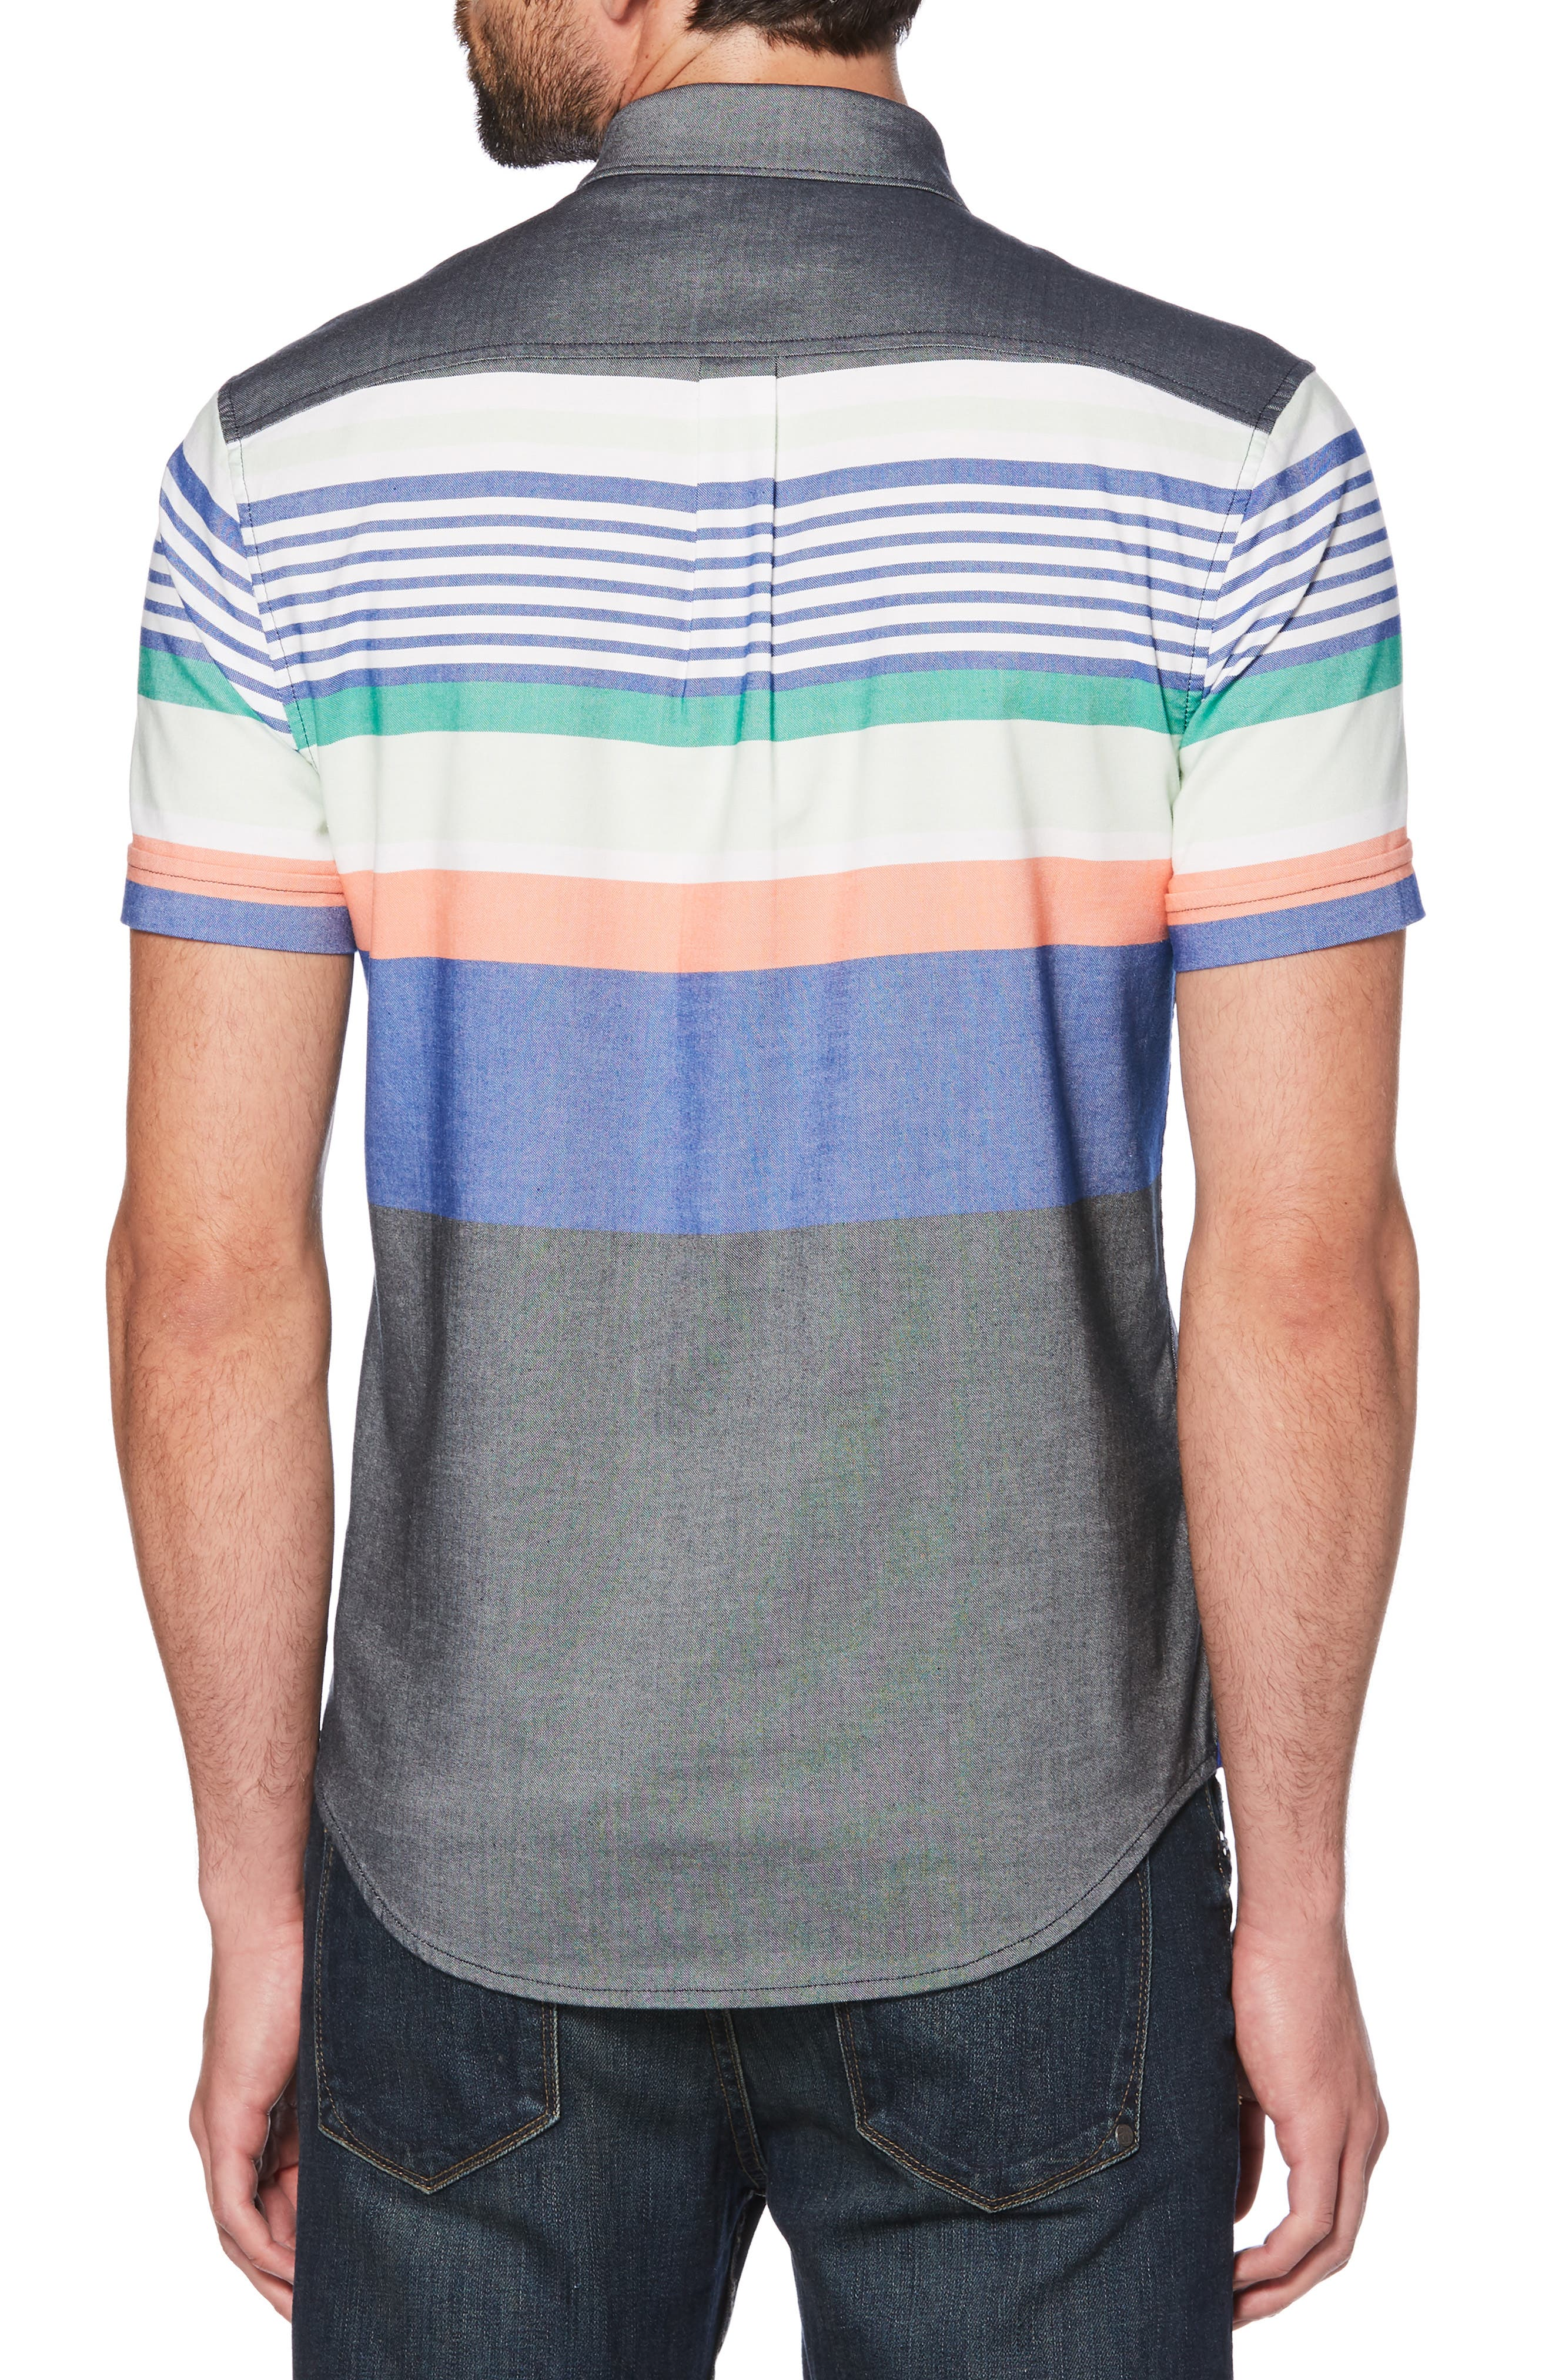 ORIGINAL PENGUIN, Engineered Stripe Woven Shirt, Alternate thumbnail 2, color, BRIGHT WHITE